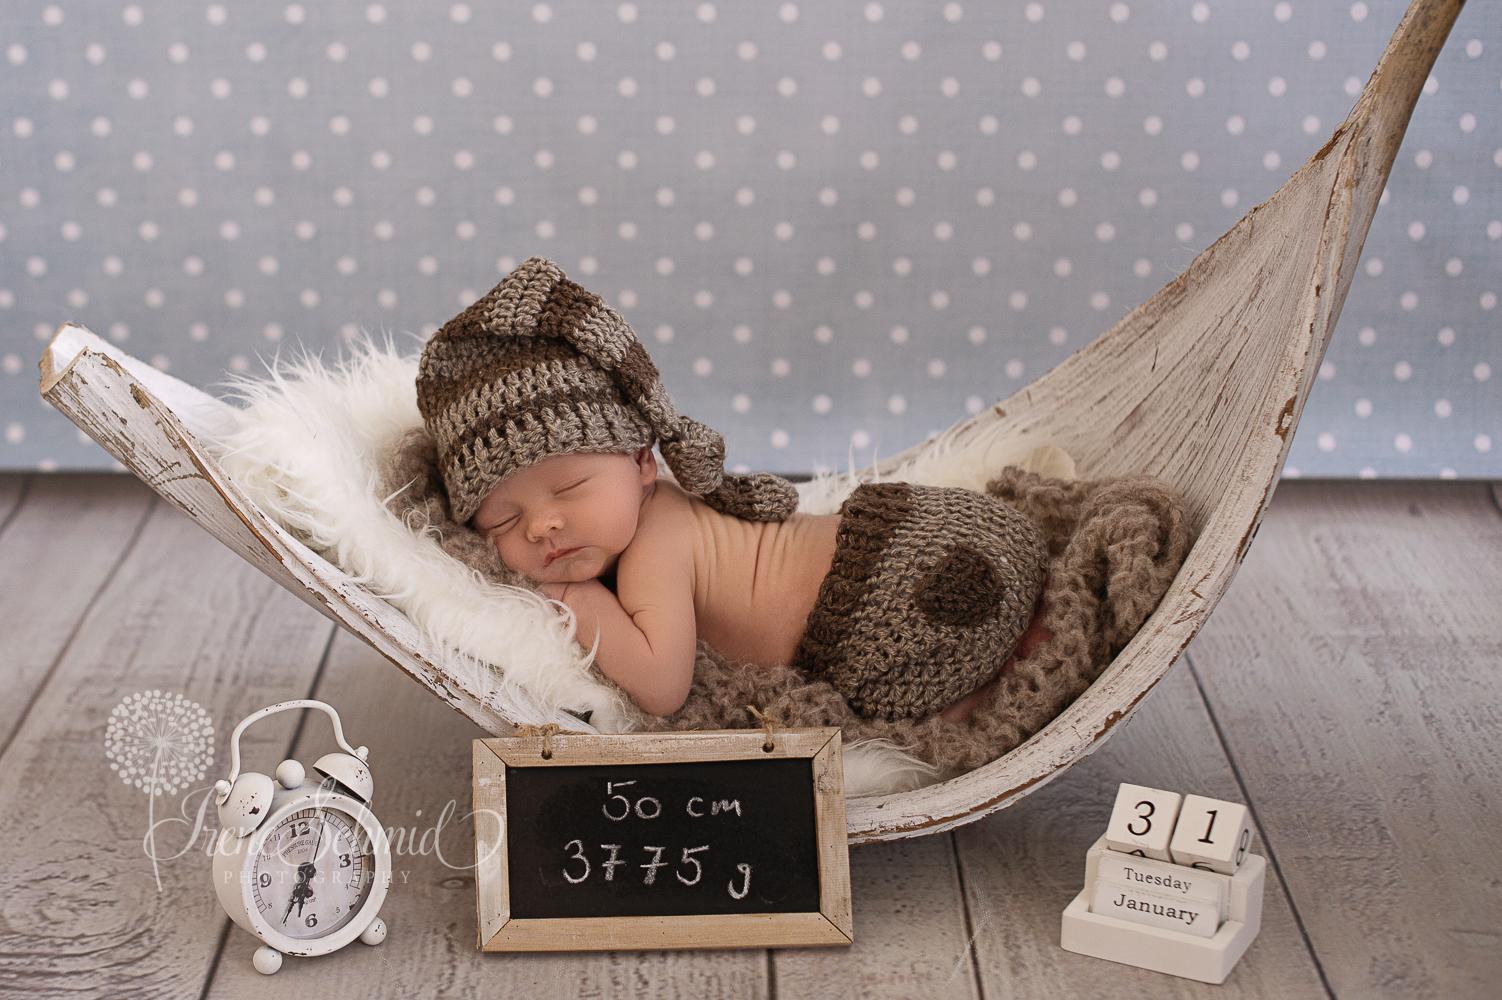 Newbornshooting mit Irene Schmid aus Winterthur